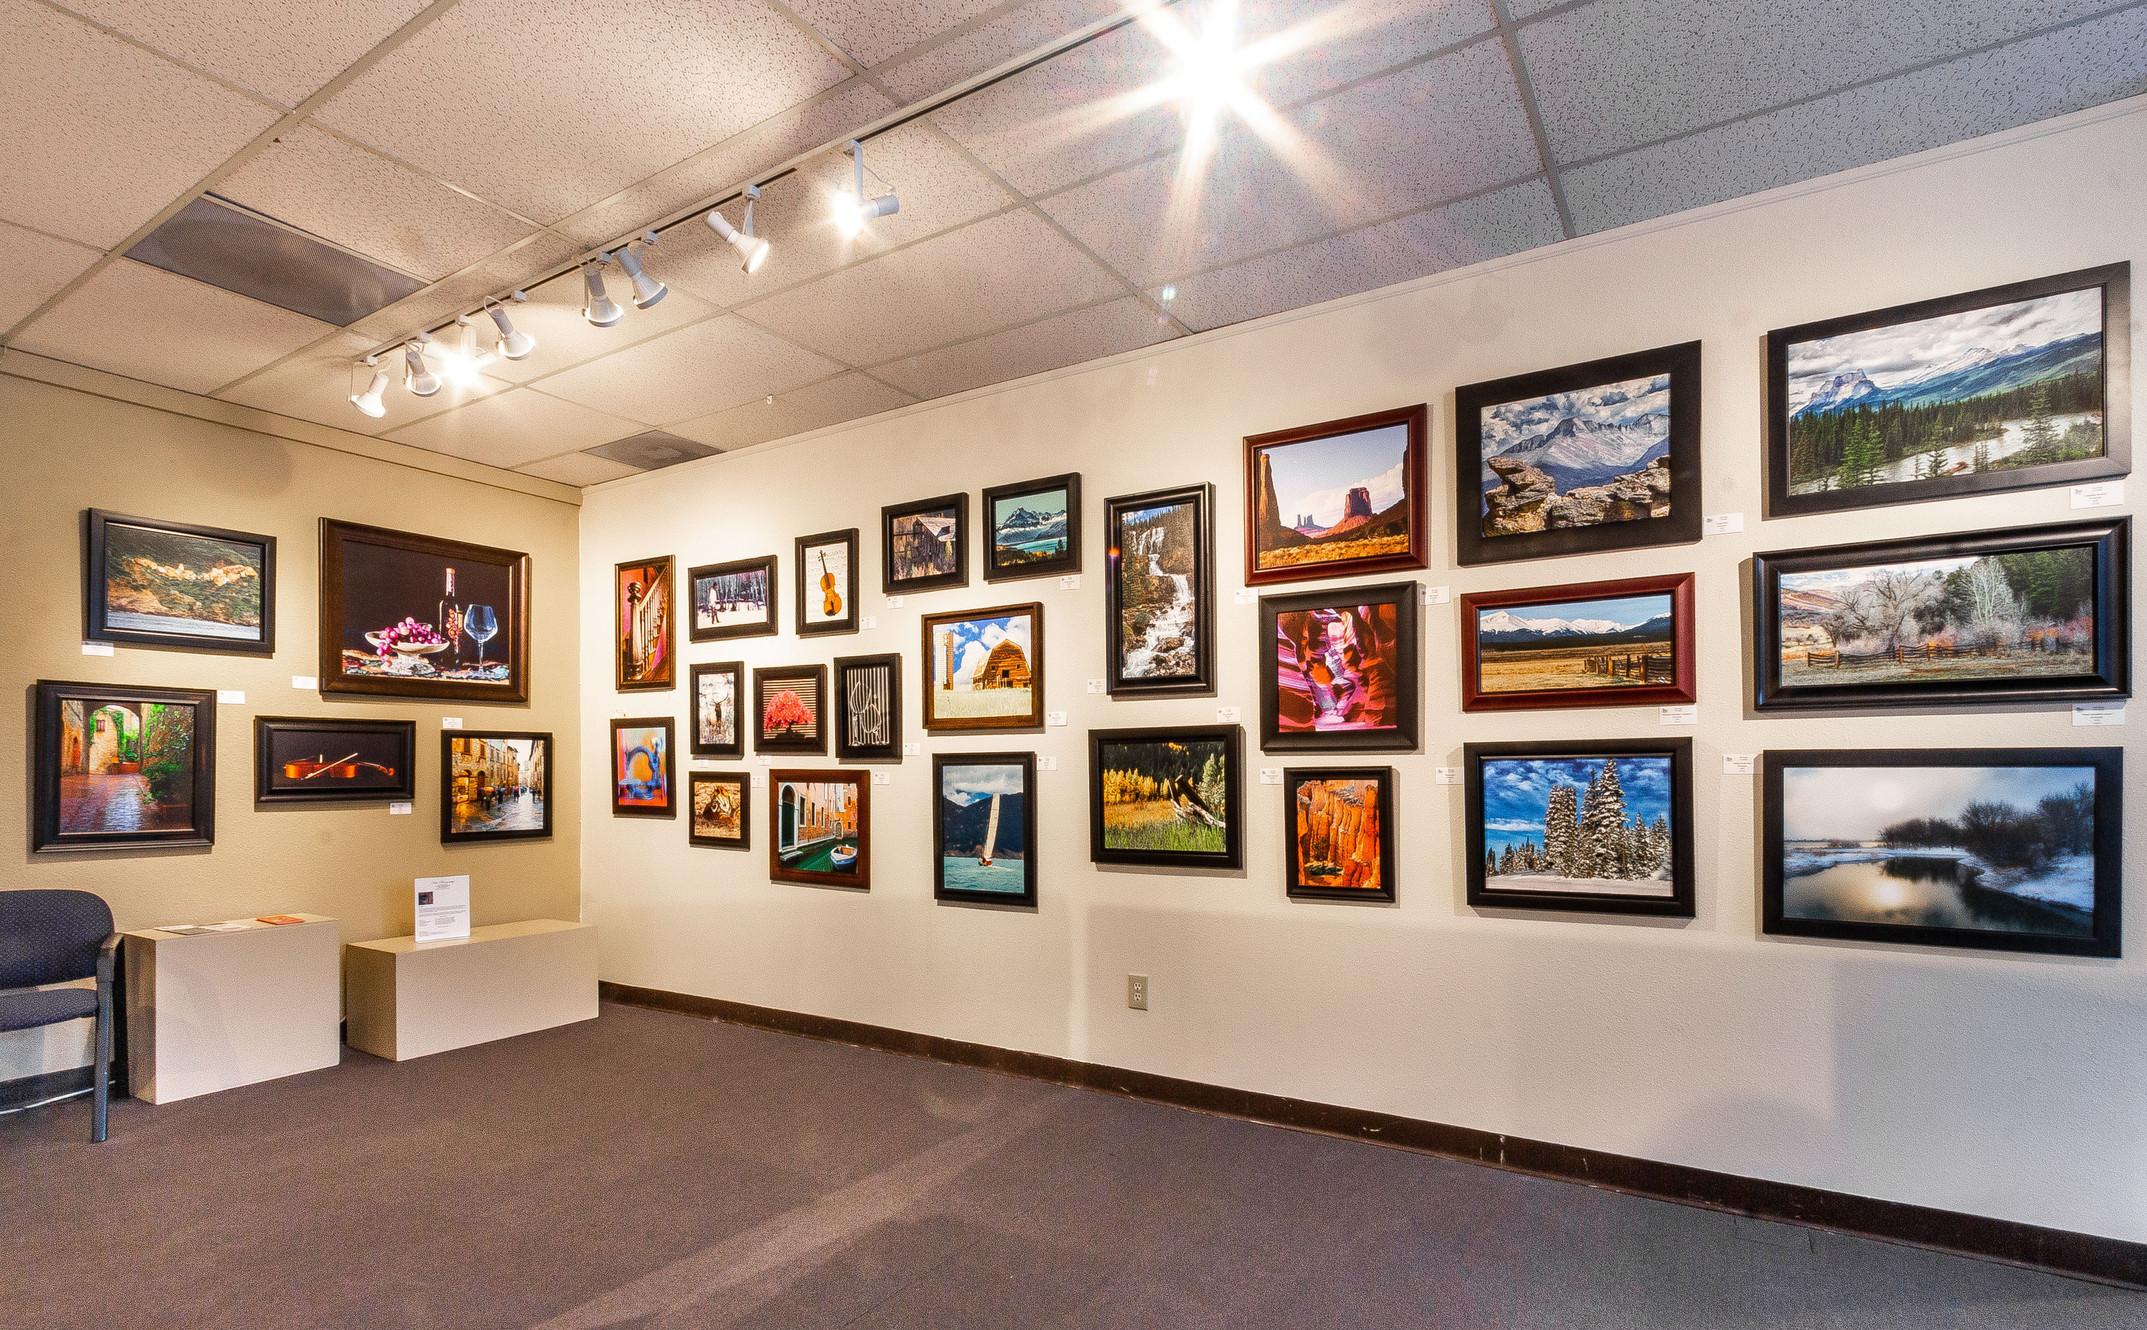 Home Art Center Of Estes